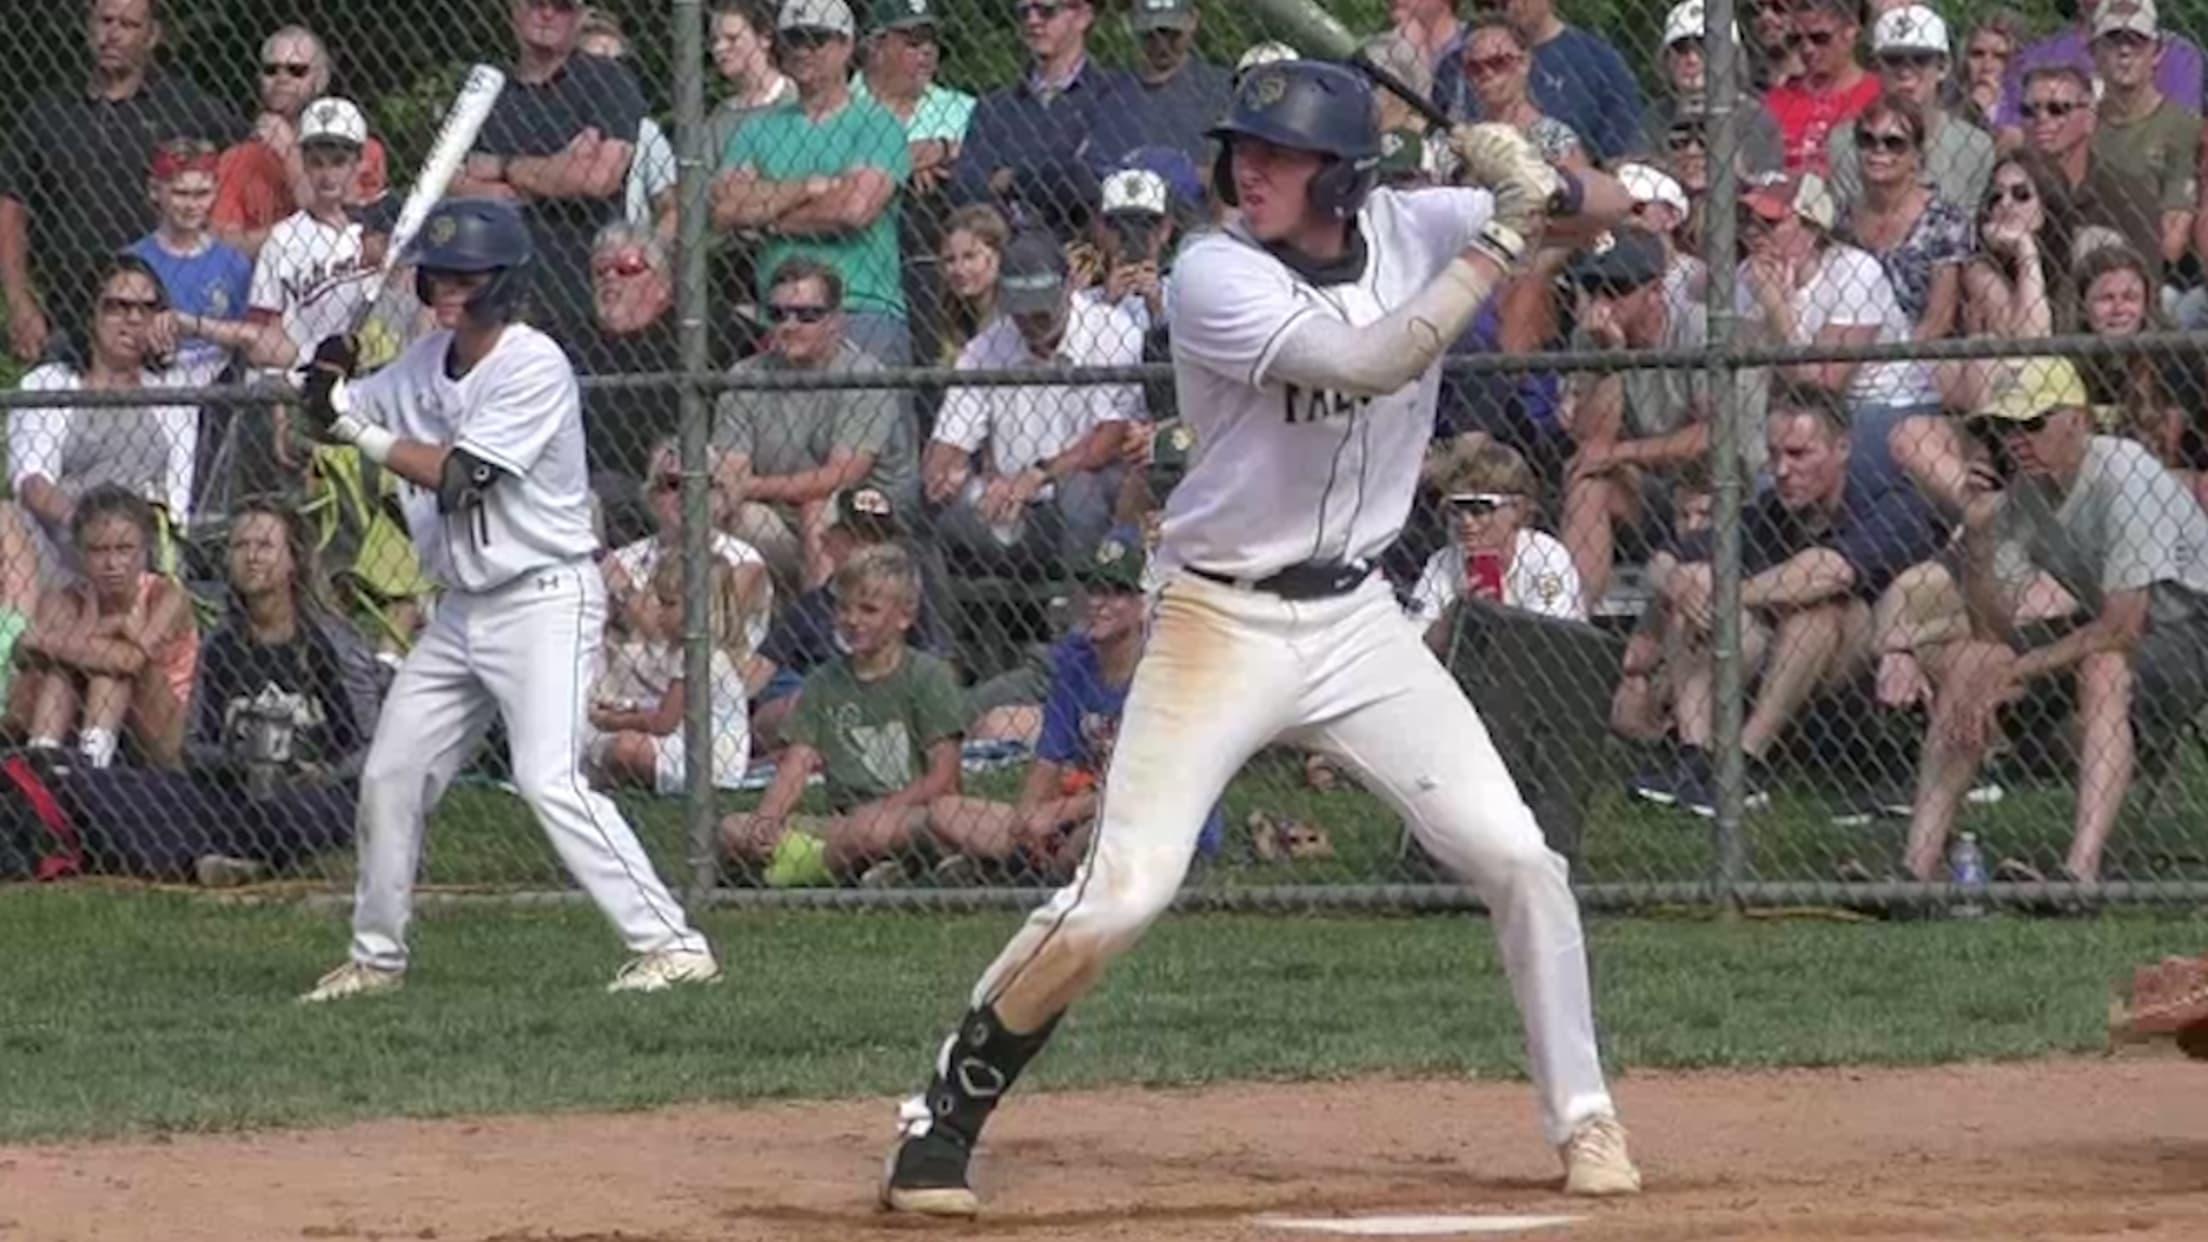 2021 Draft: Jackson Merrill, RHP